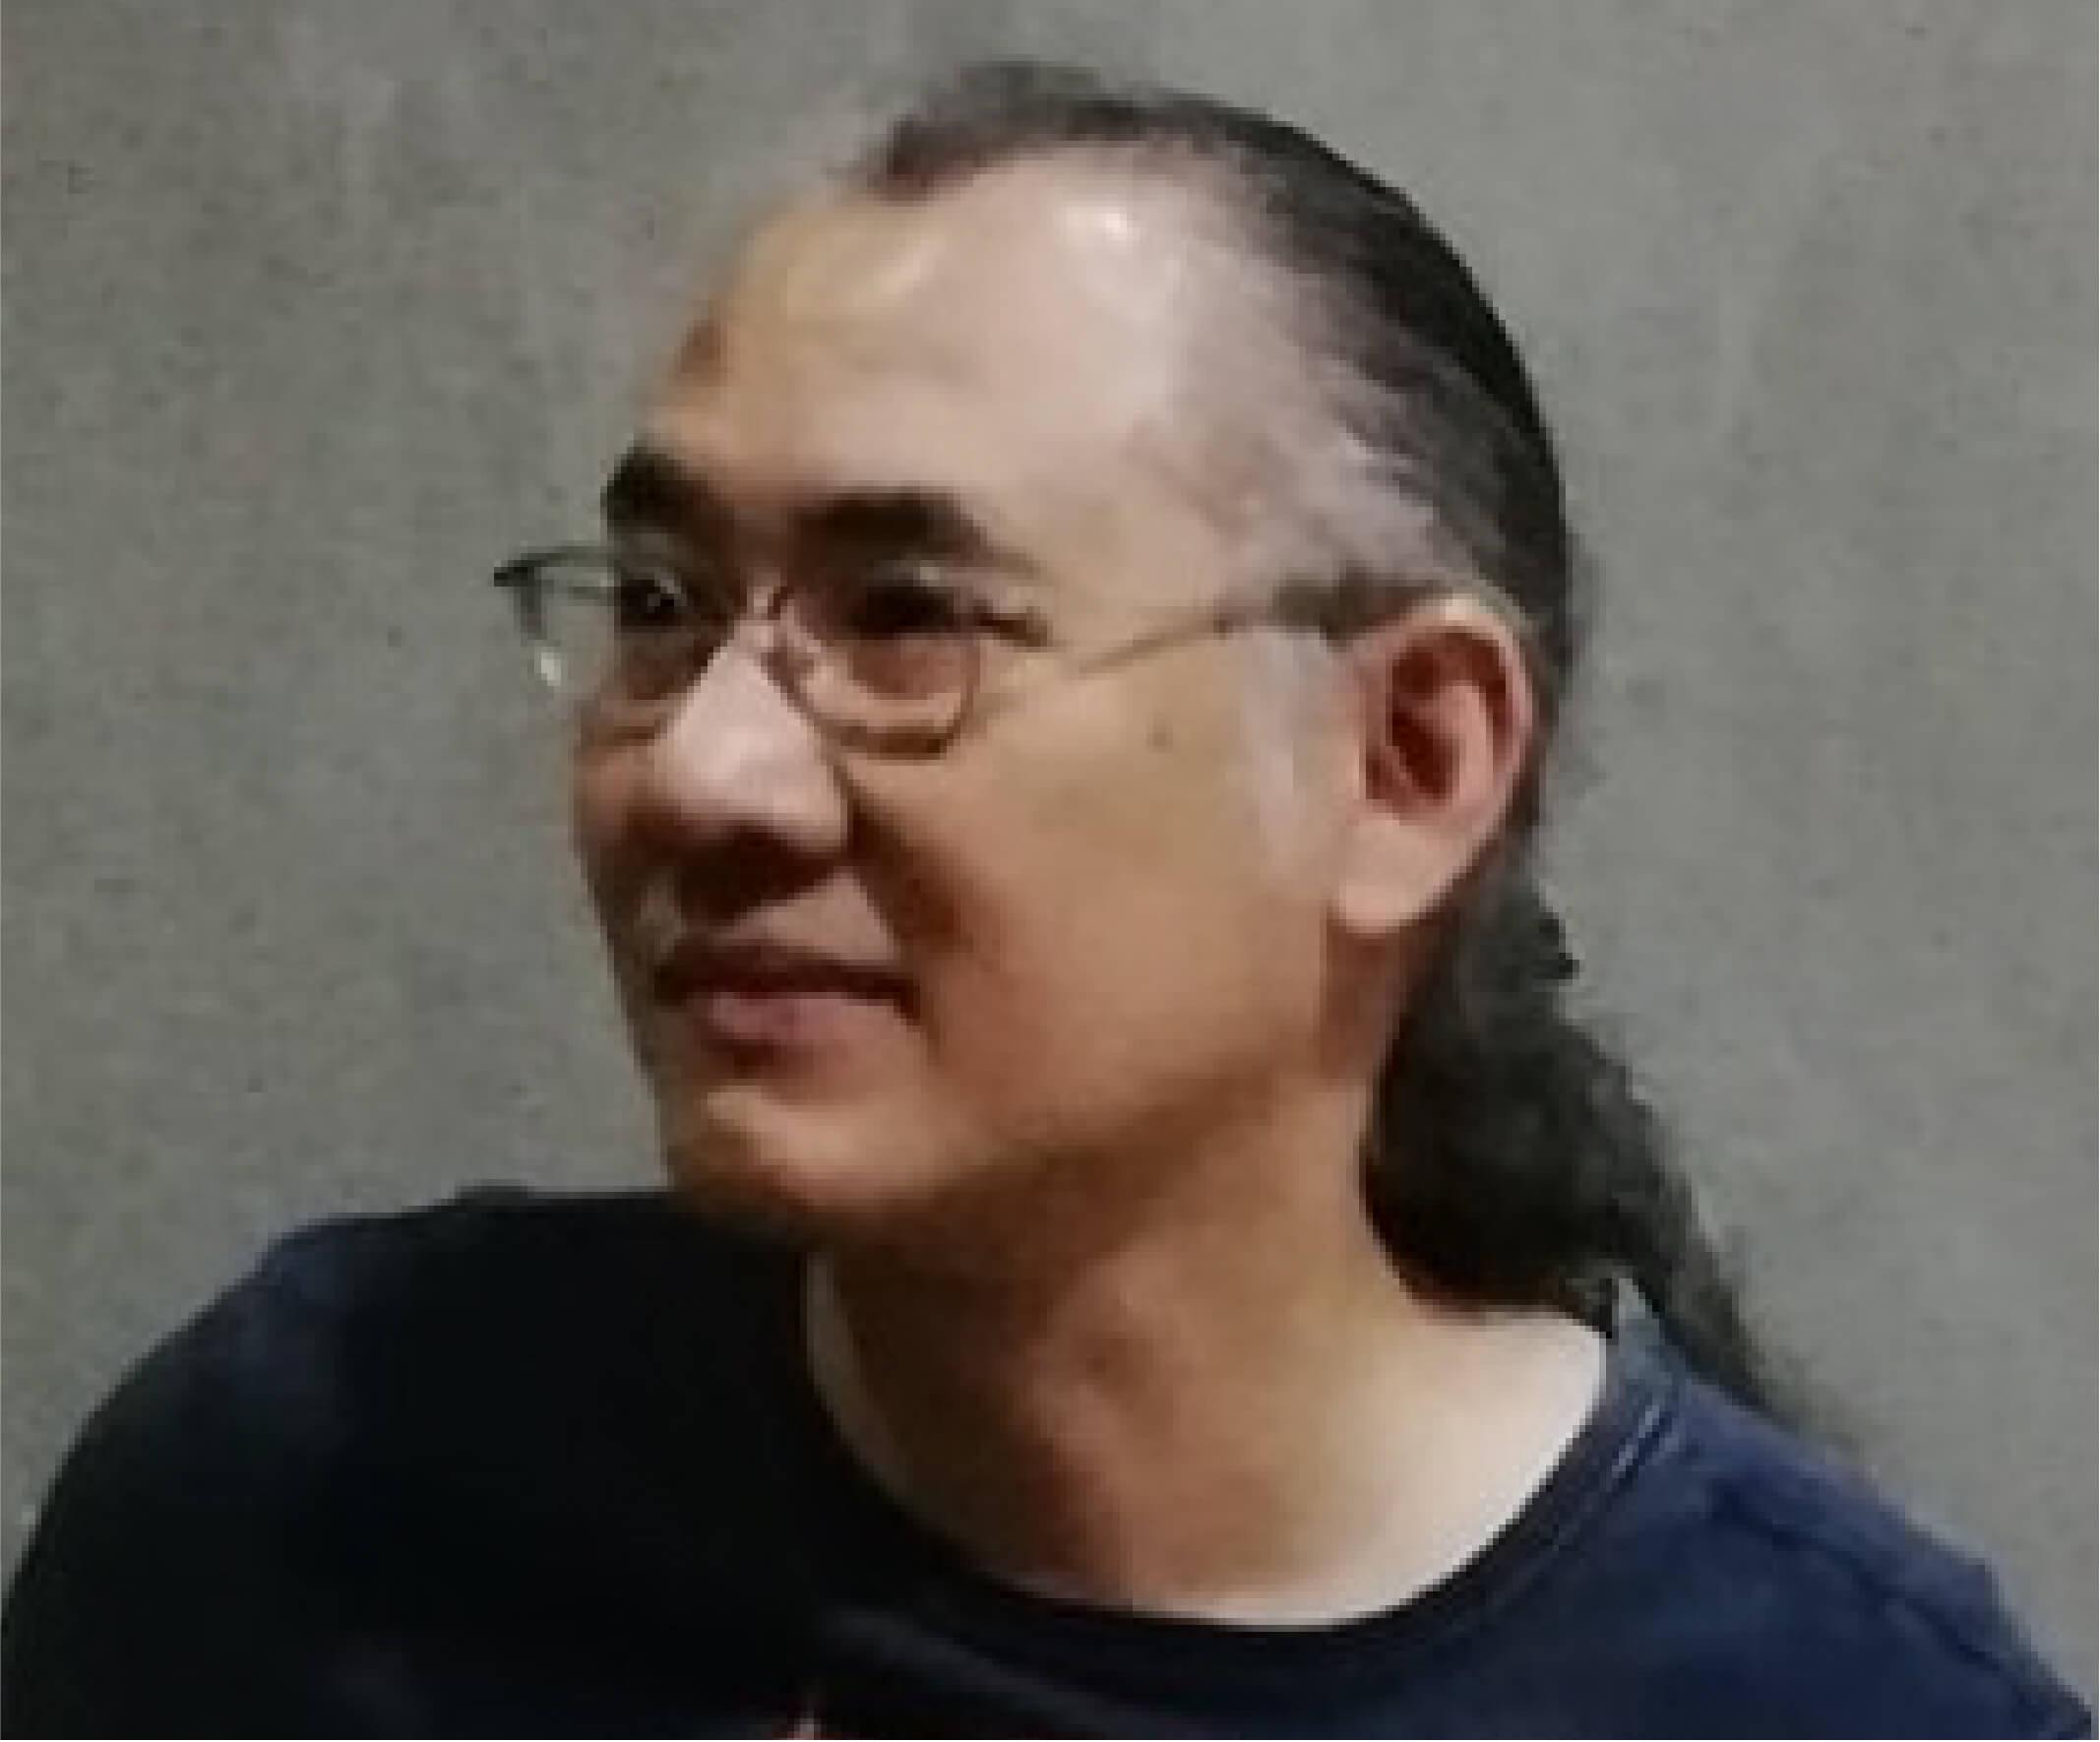 Wiroj Satapanawat